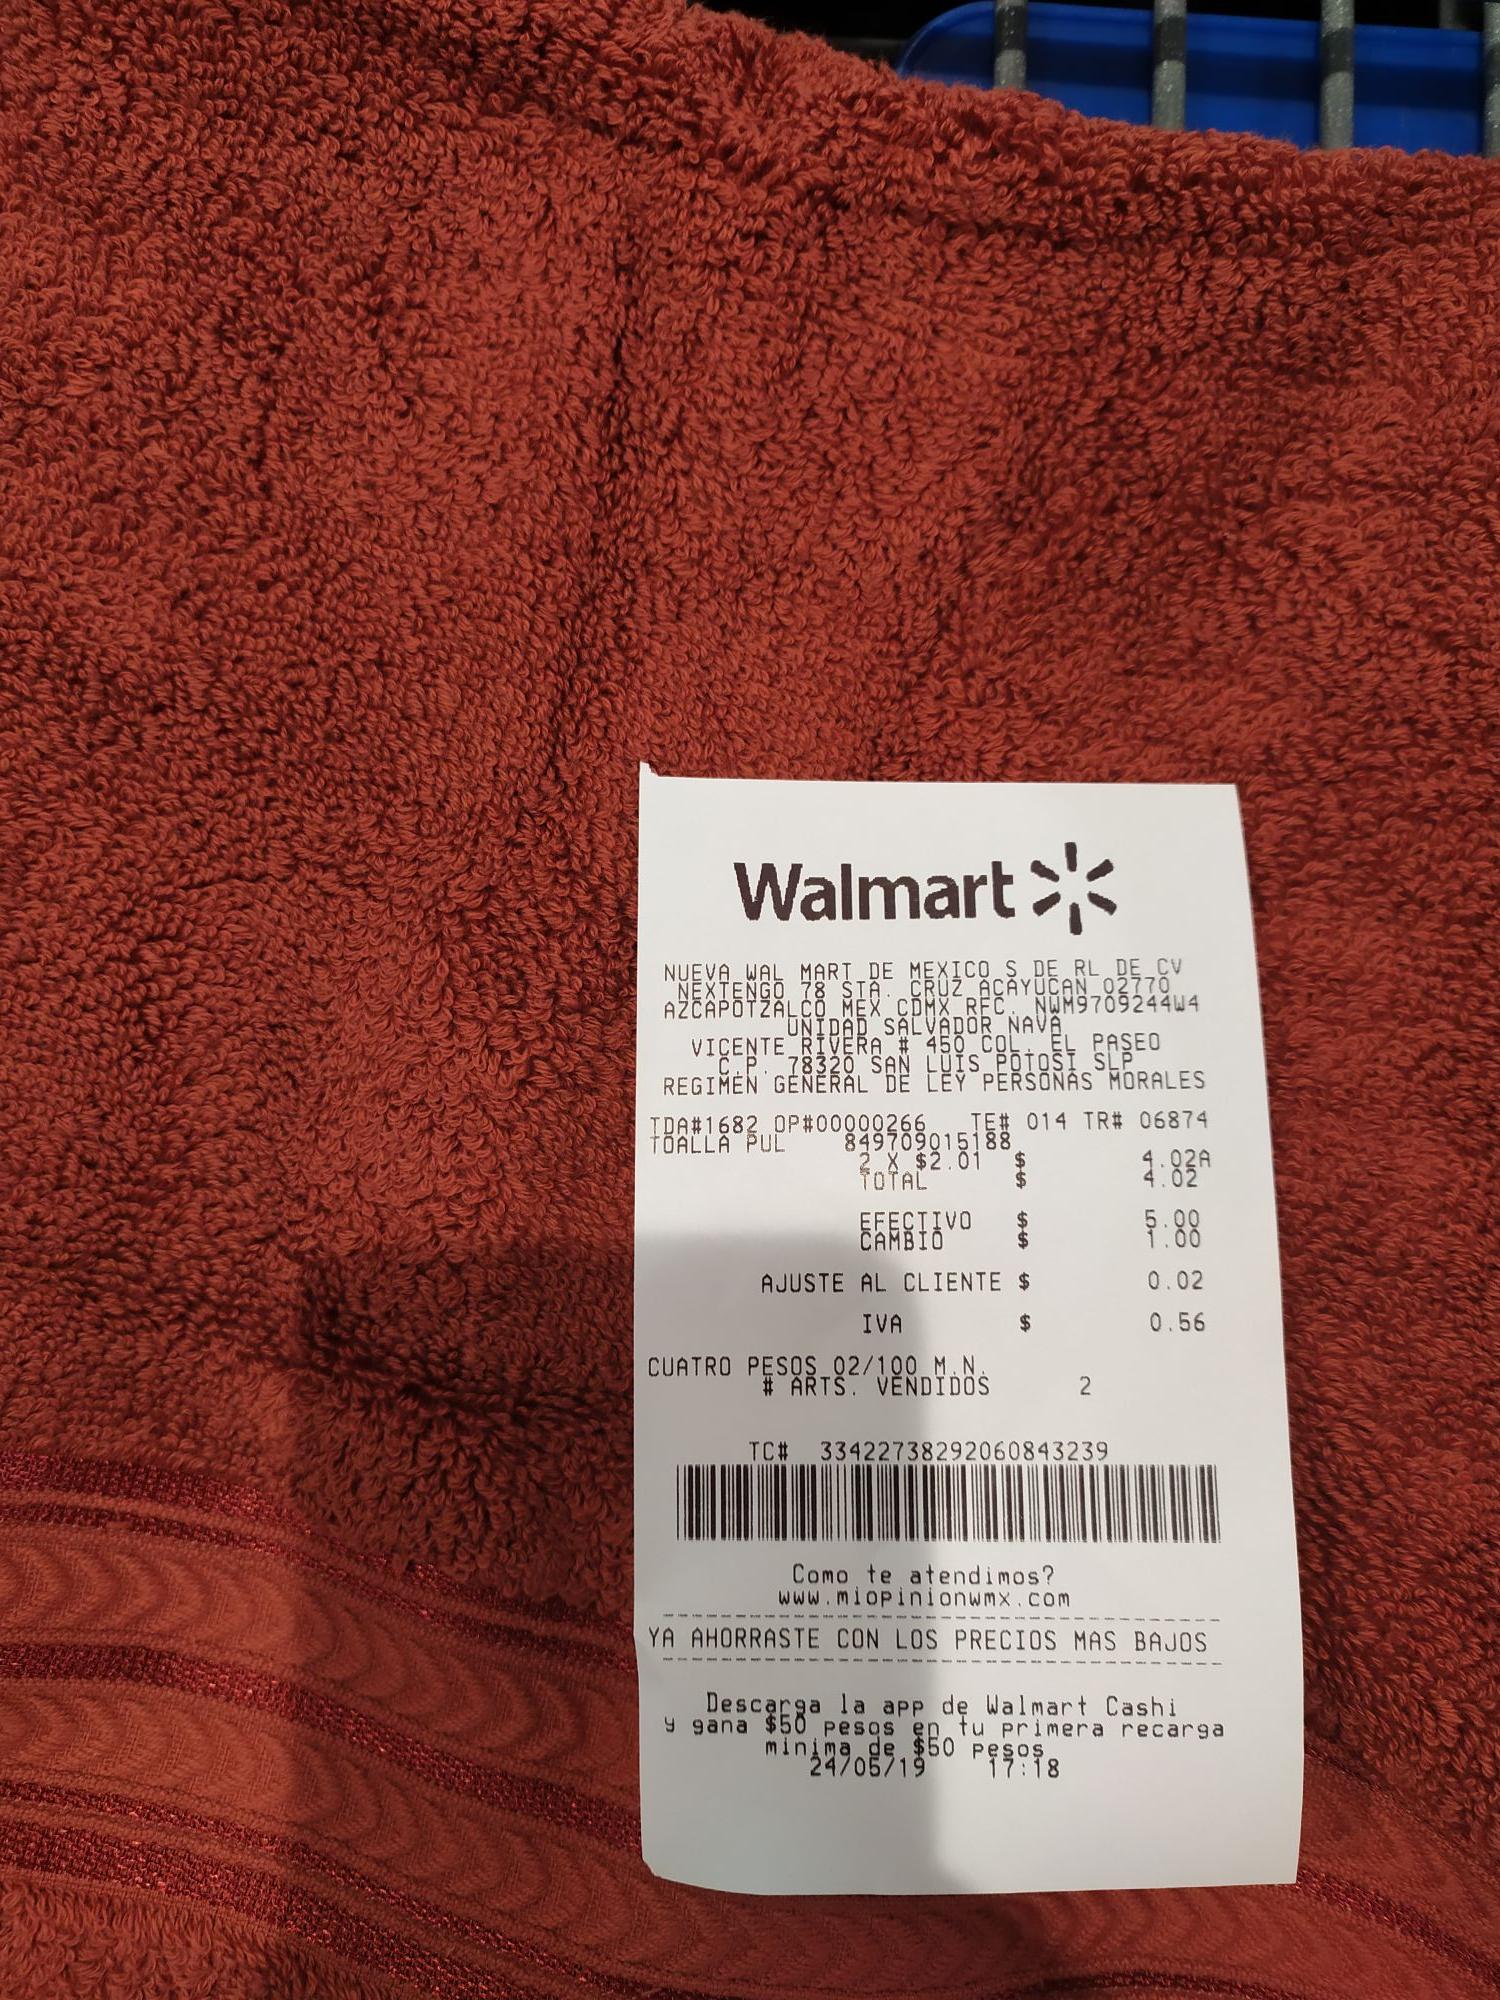 Walmart Macroplaza SLP: Toalla better homes 2.01